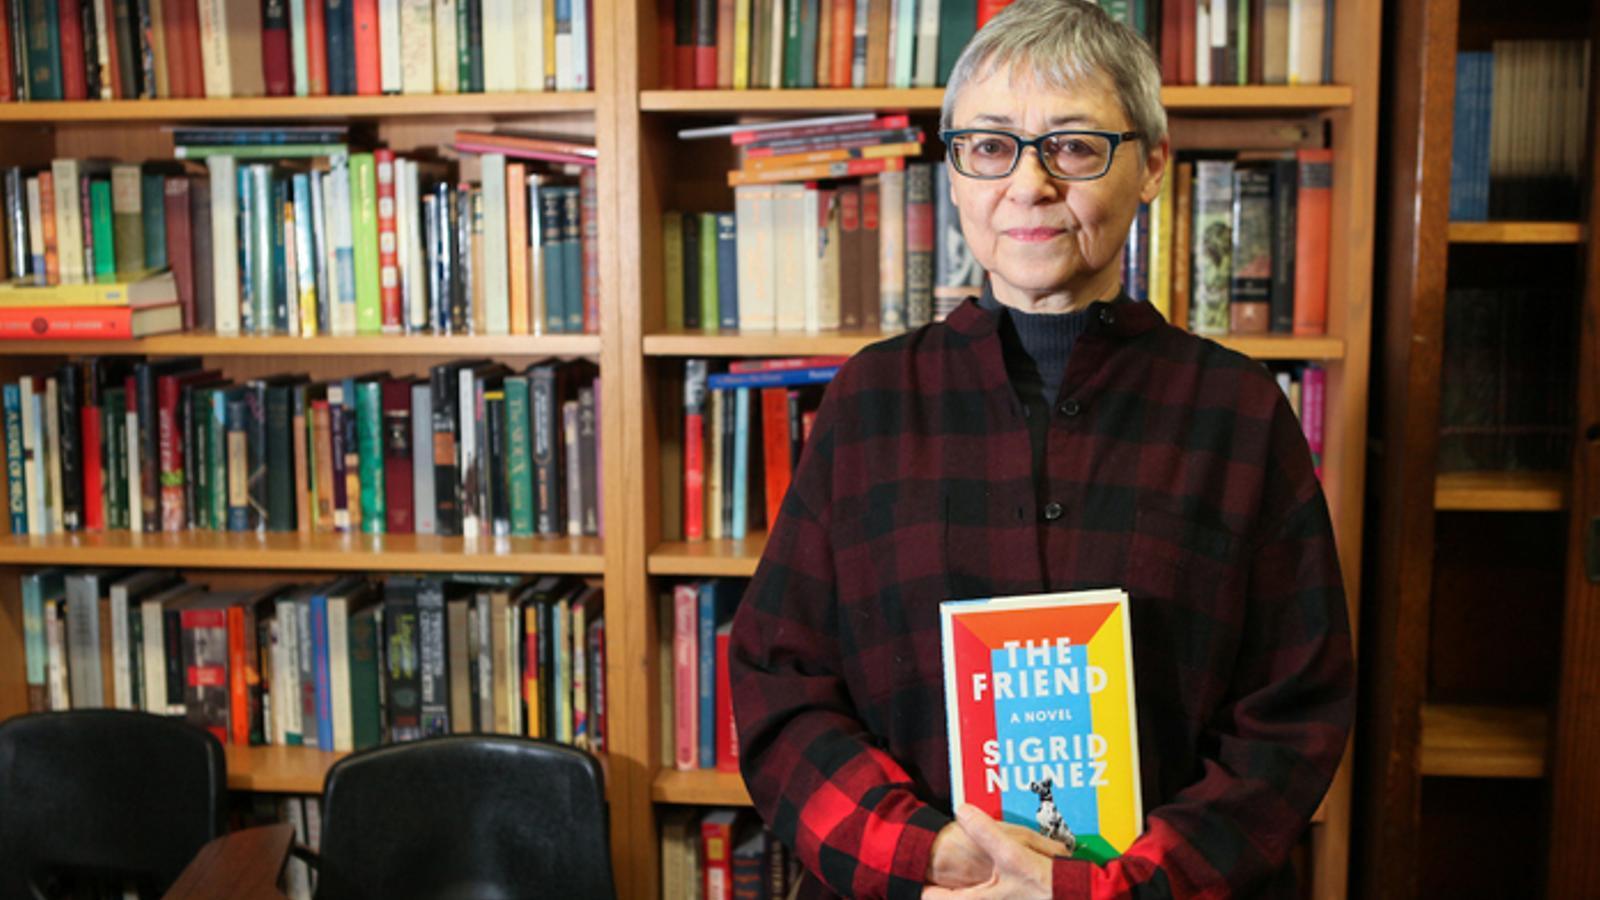 Sigrid Nunez, autora de 'L'amic'